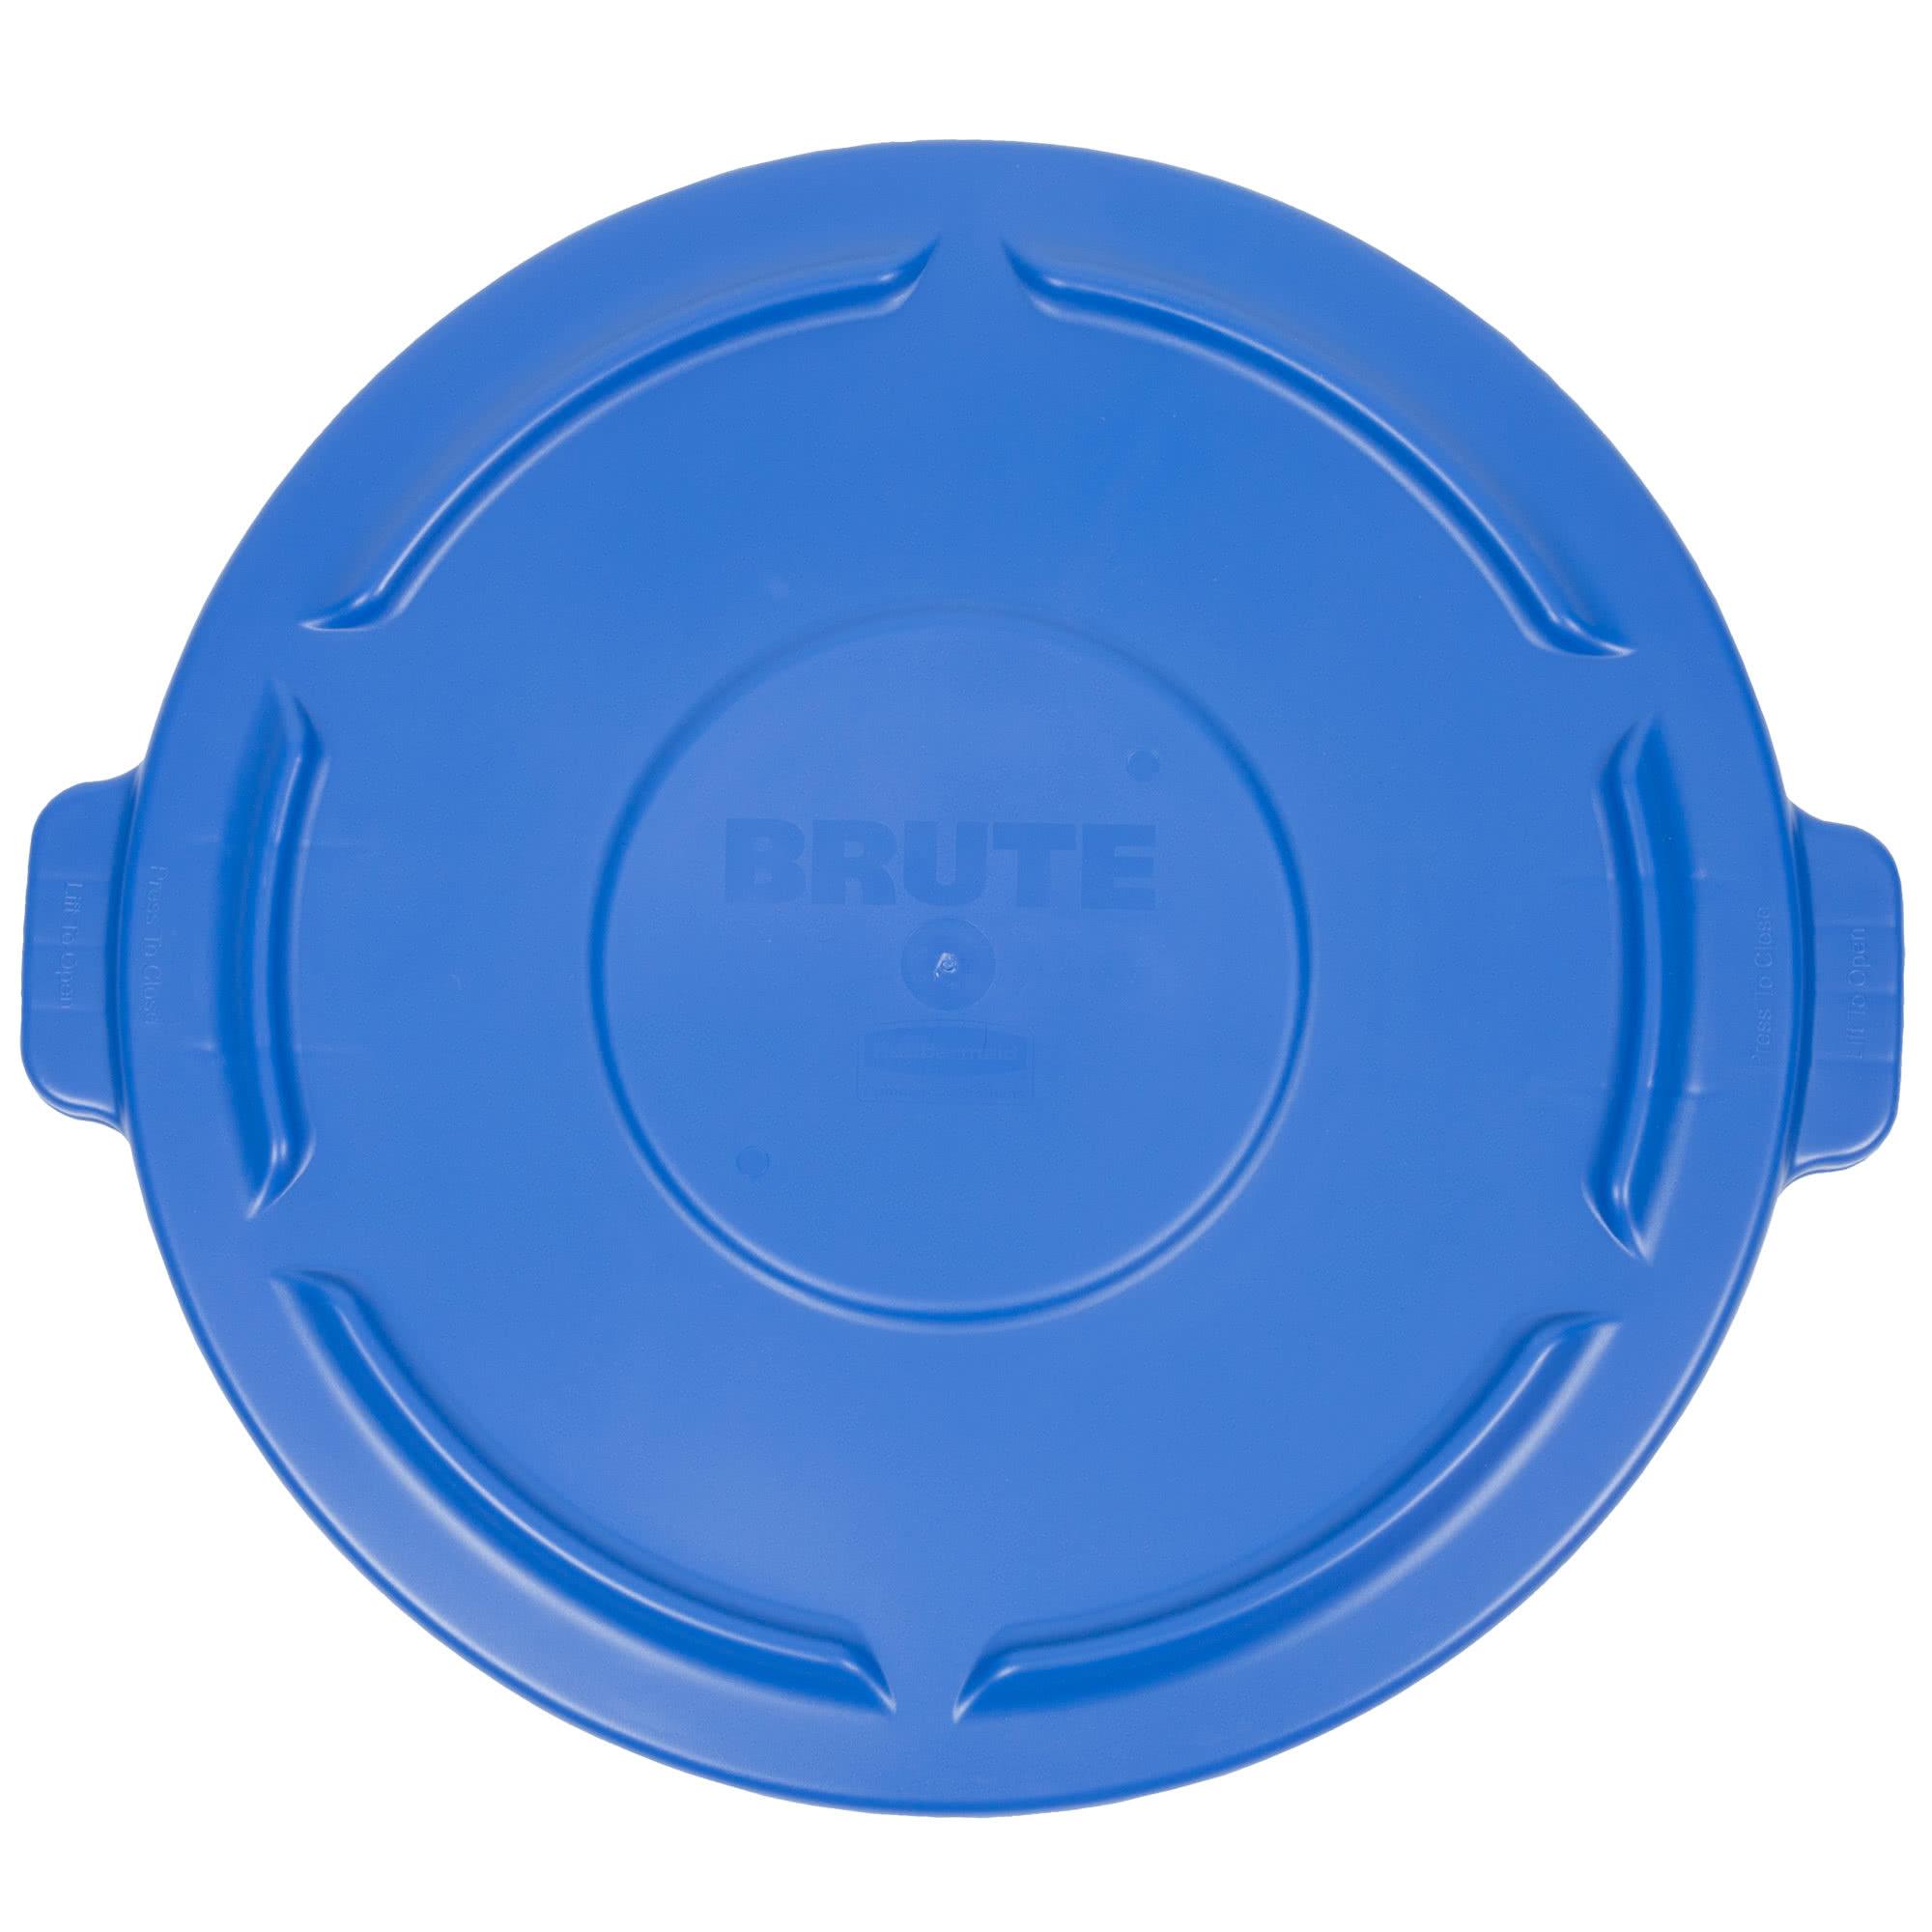 Rubbermaid 1779636 tapa Brute autodrenable color azul, aplica contenedor Brute de 44 galones           1